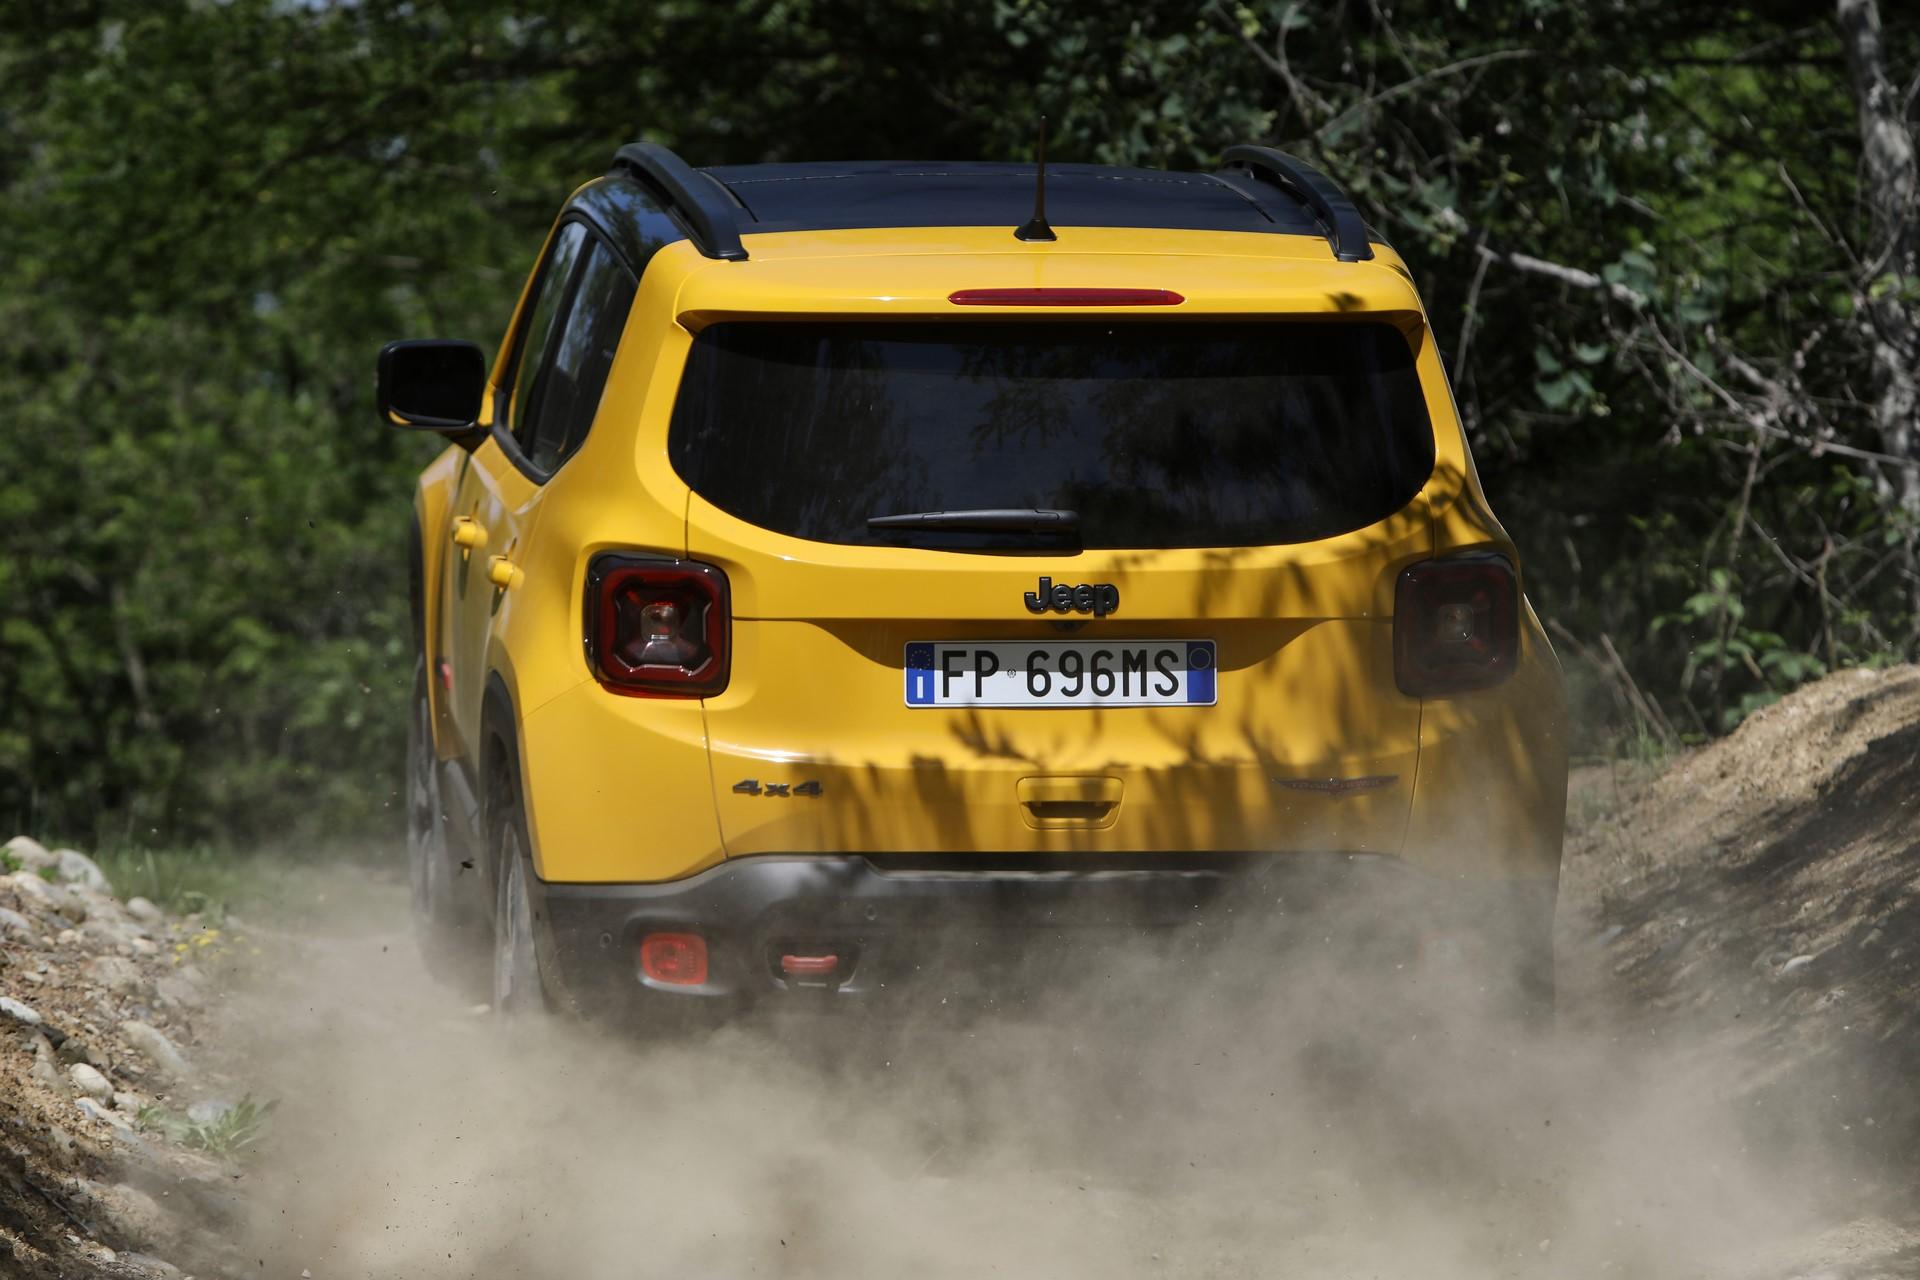 Jeep Renegade facelift 2019 (48)